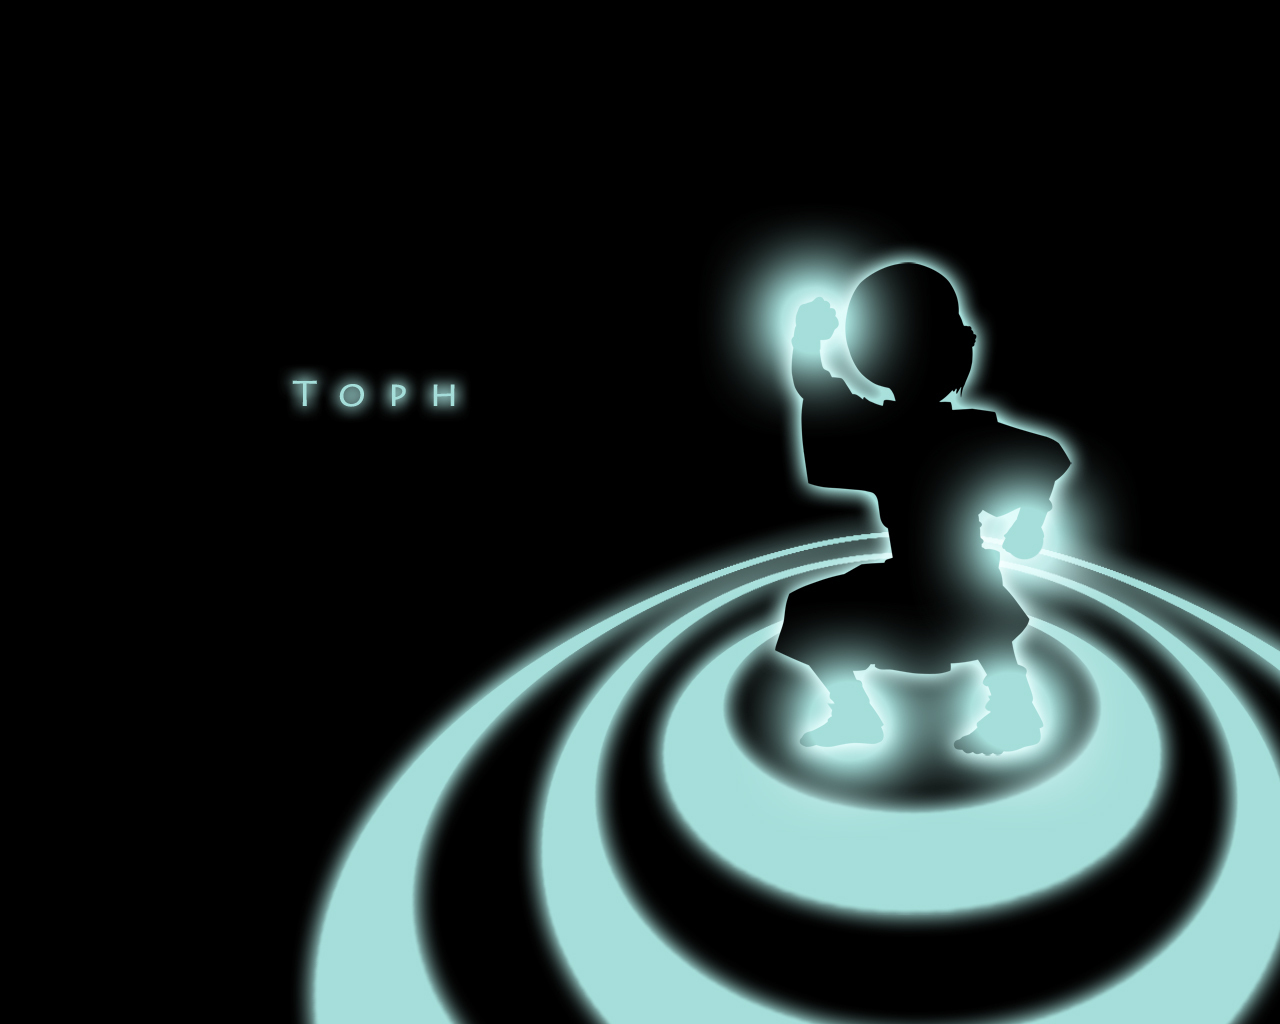 Toph_Wallpaper_by_Cupkik.jpg